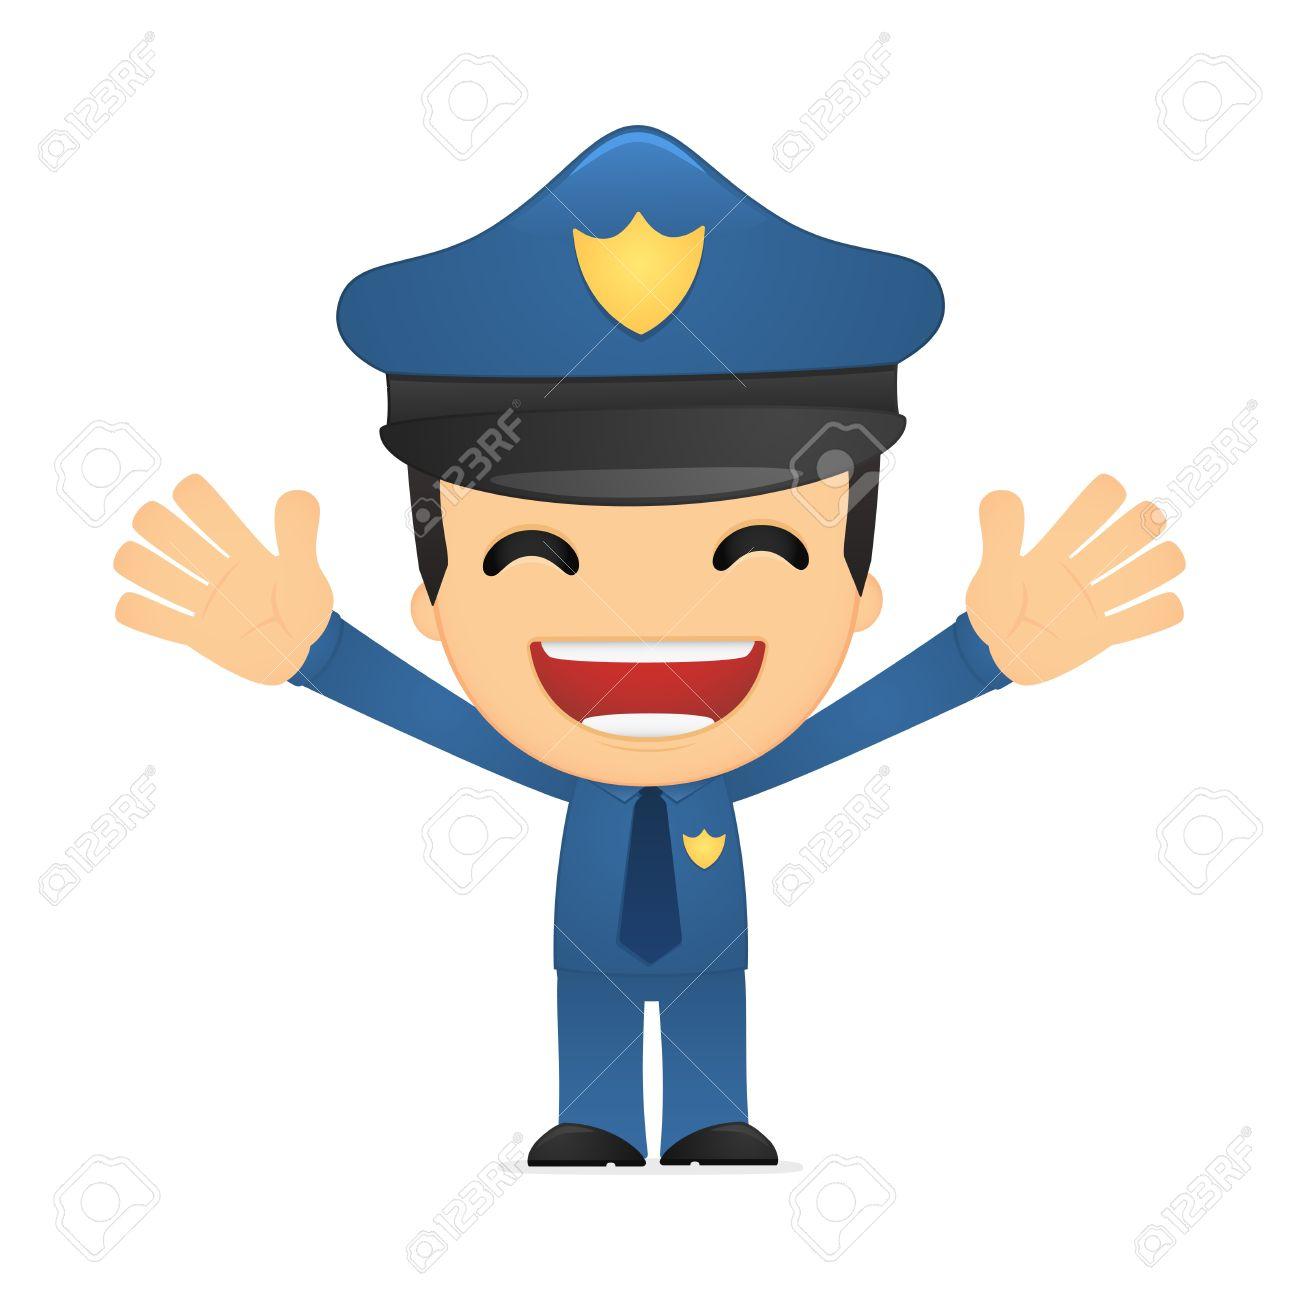 Resultado de imagen de DIBUJOS policia nacional